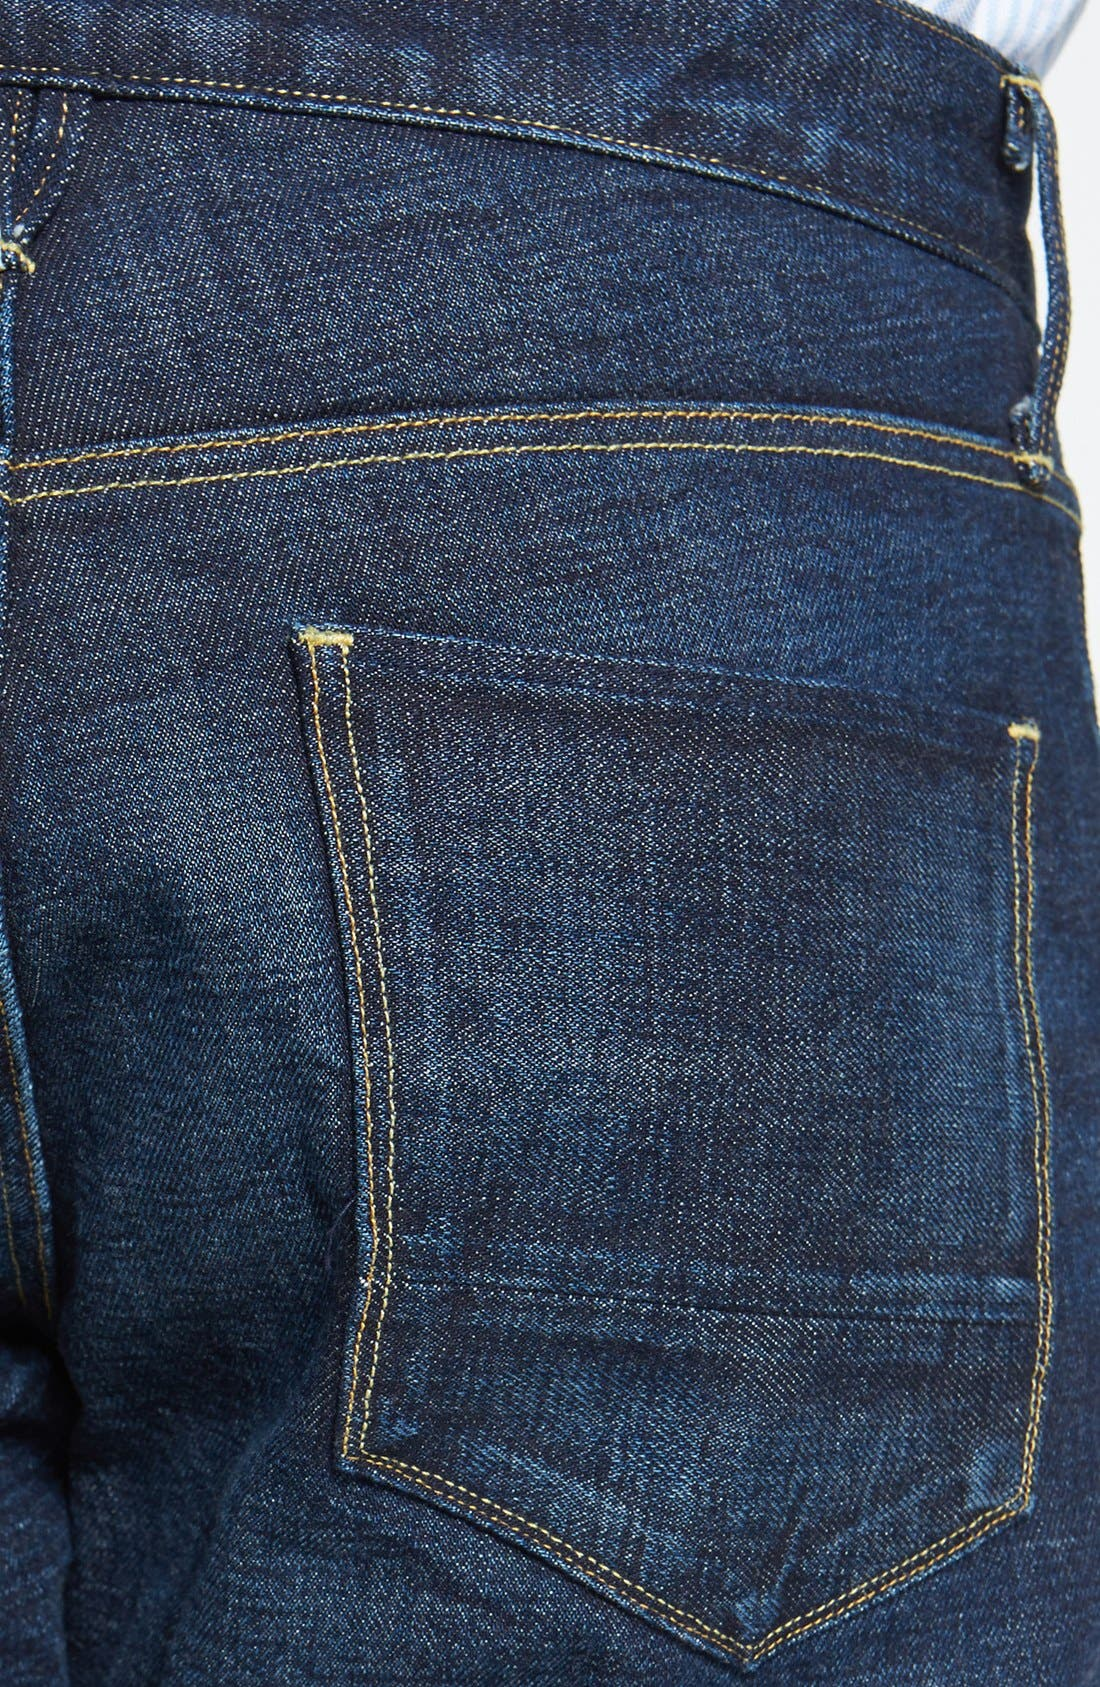 Alternate Image 4  - 3x1 NYC 'M4' Straight Leg Selvedge Jeans (Walker)